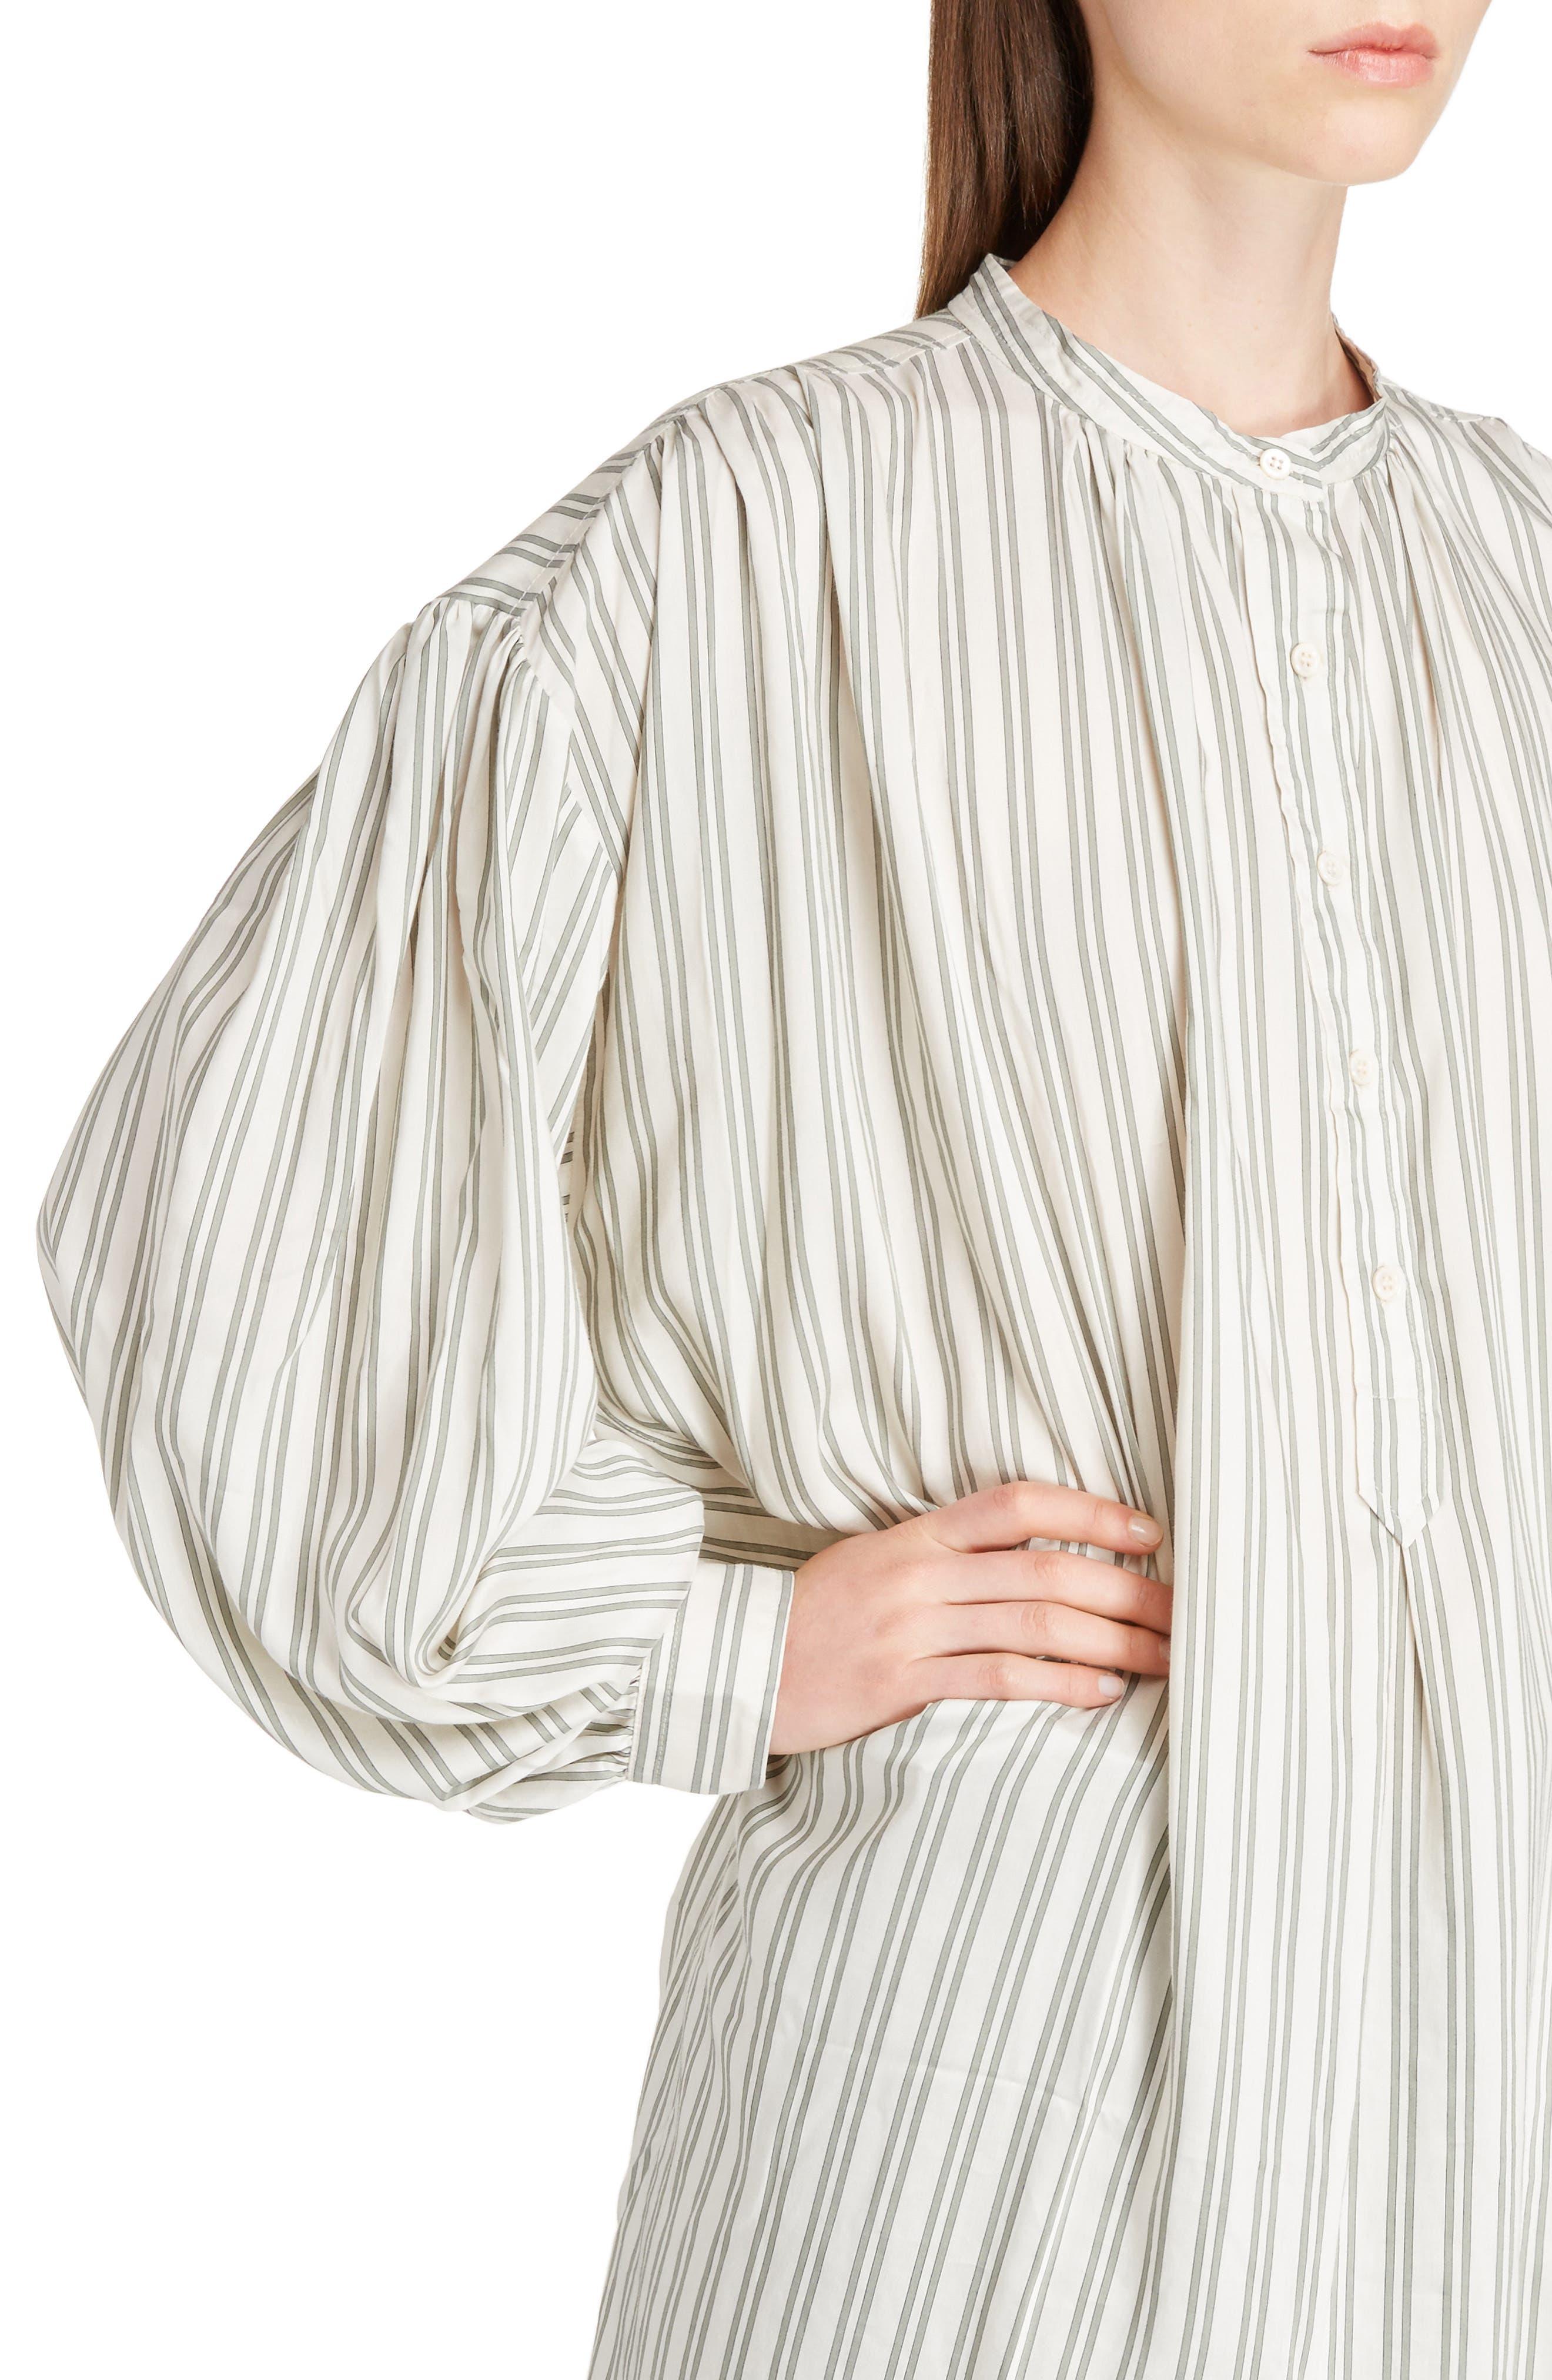 Idoa Stripe Tunic,                             Alternate thumbnail 4, color,